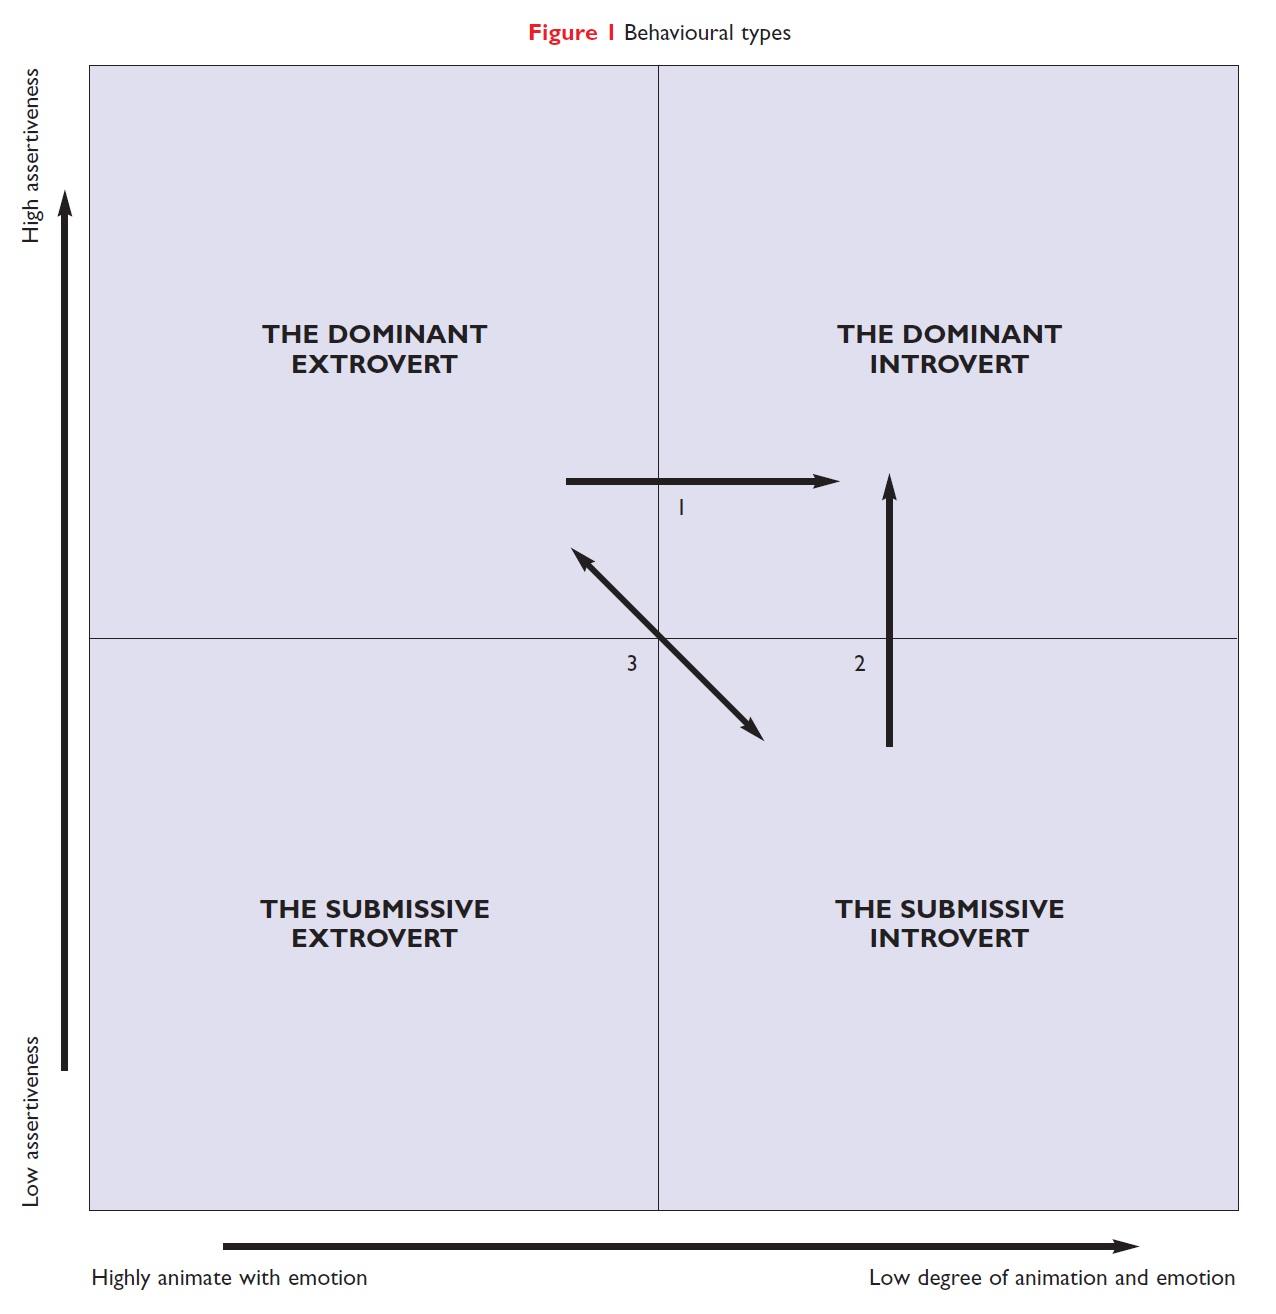 Figure 1 Behavioural types